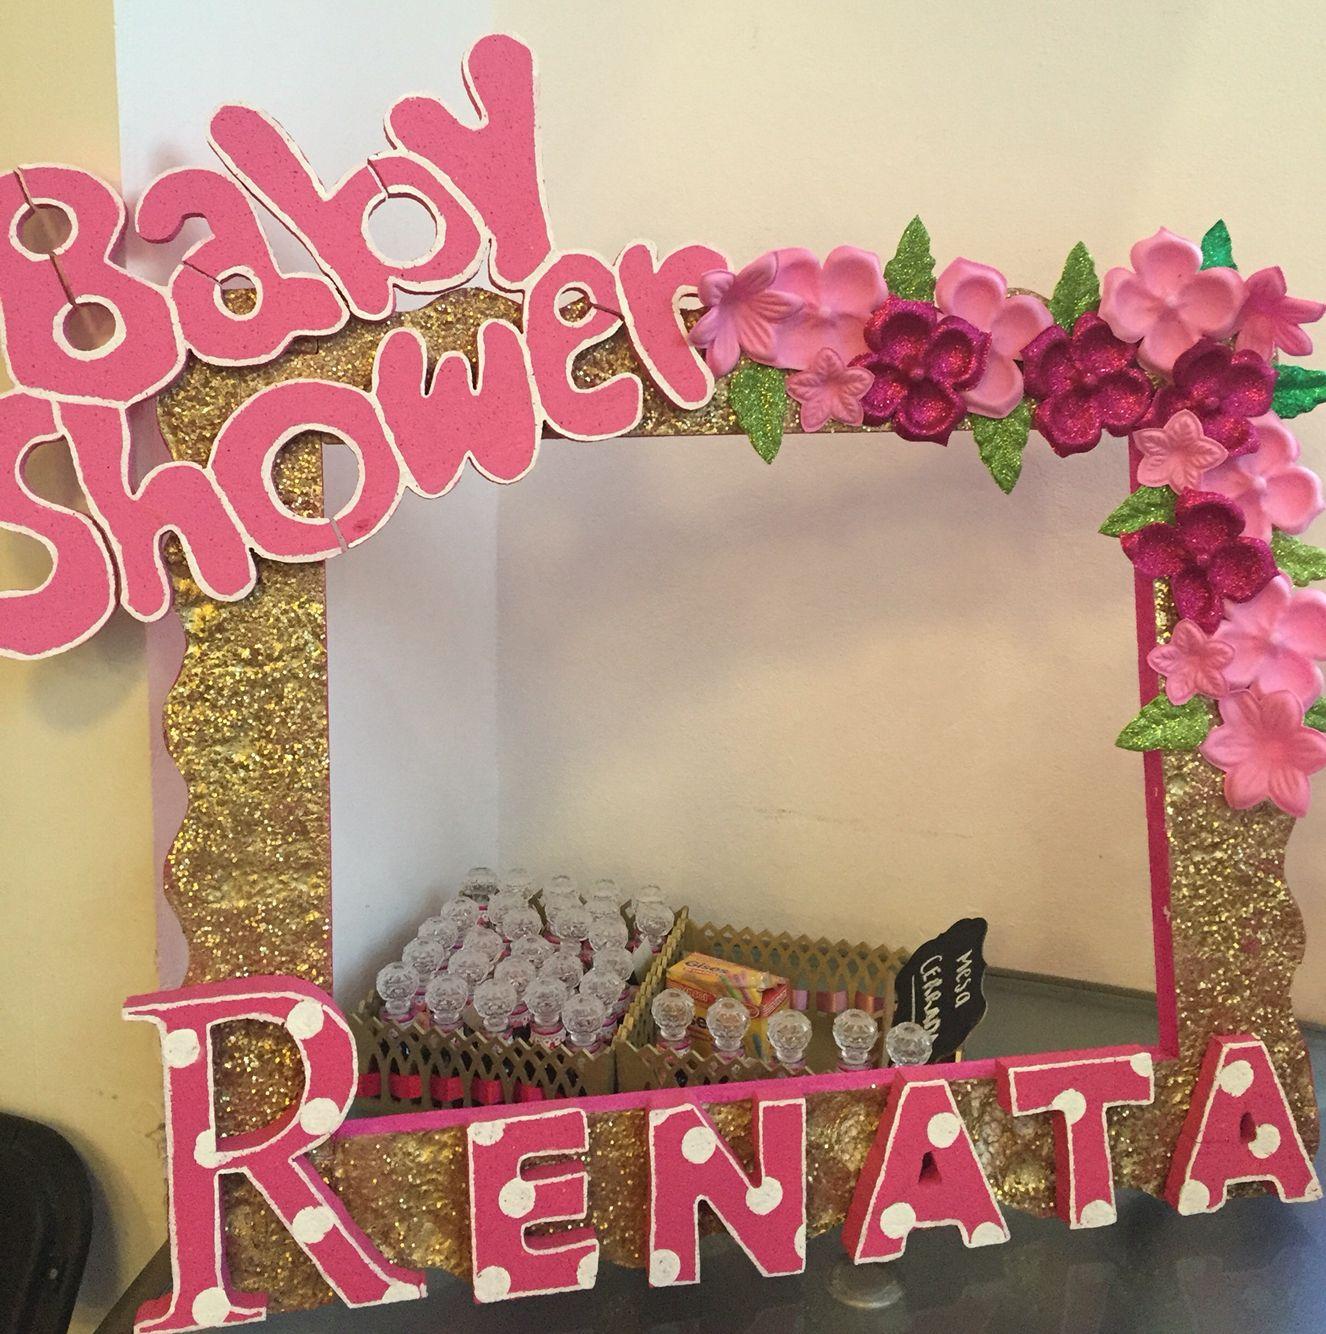 Baby shower nia marco para fotos | Chachi baby shower ...